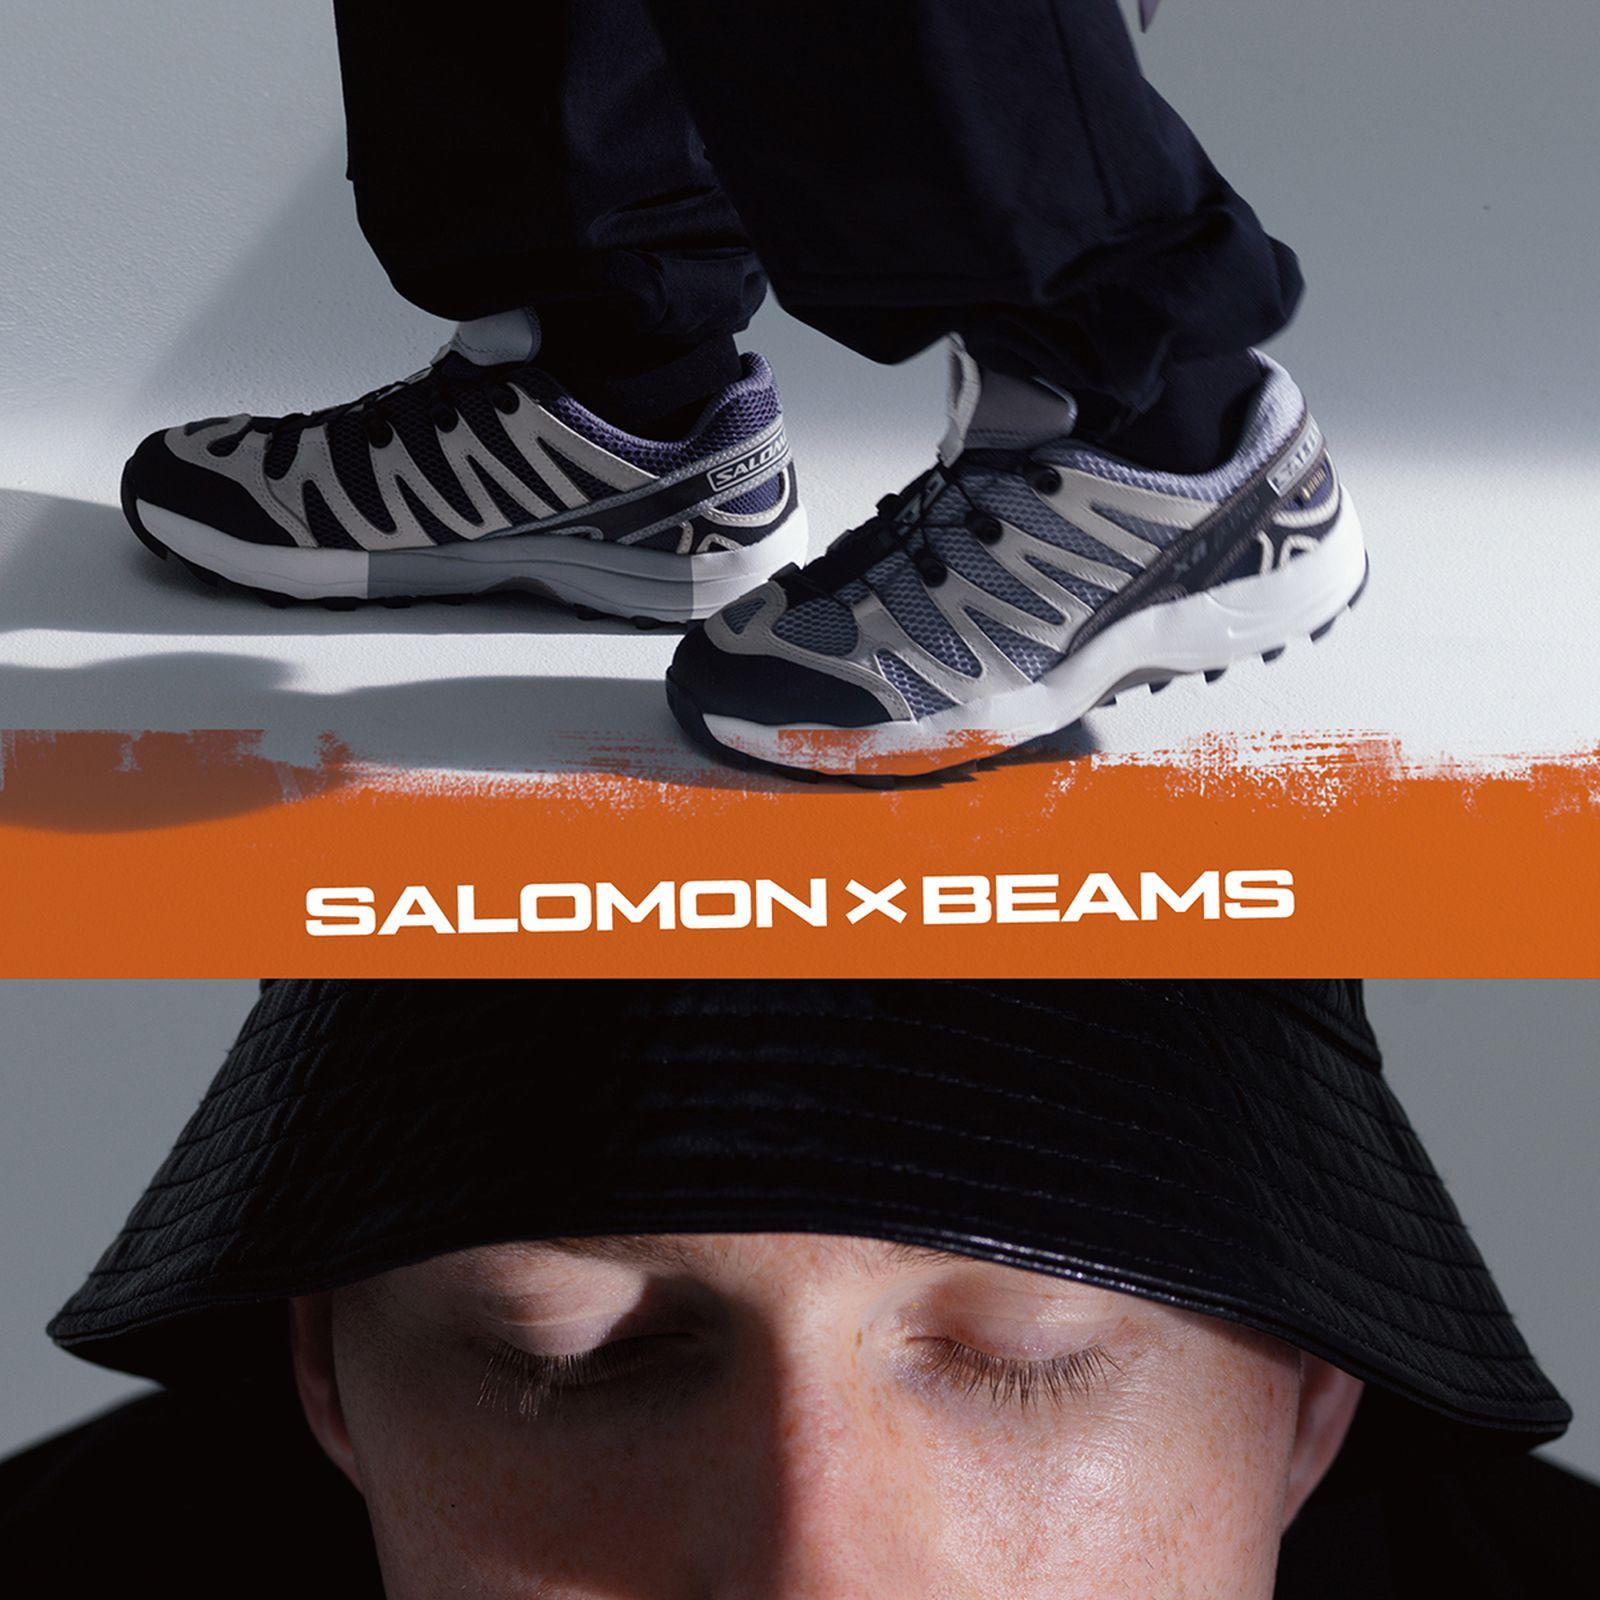 SALOMON++